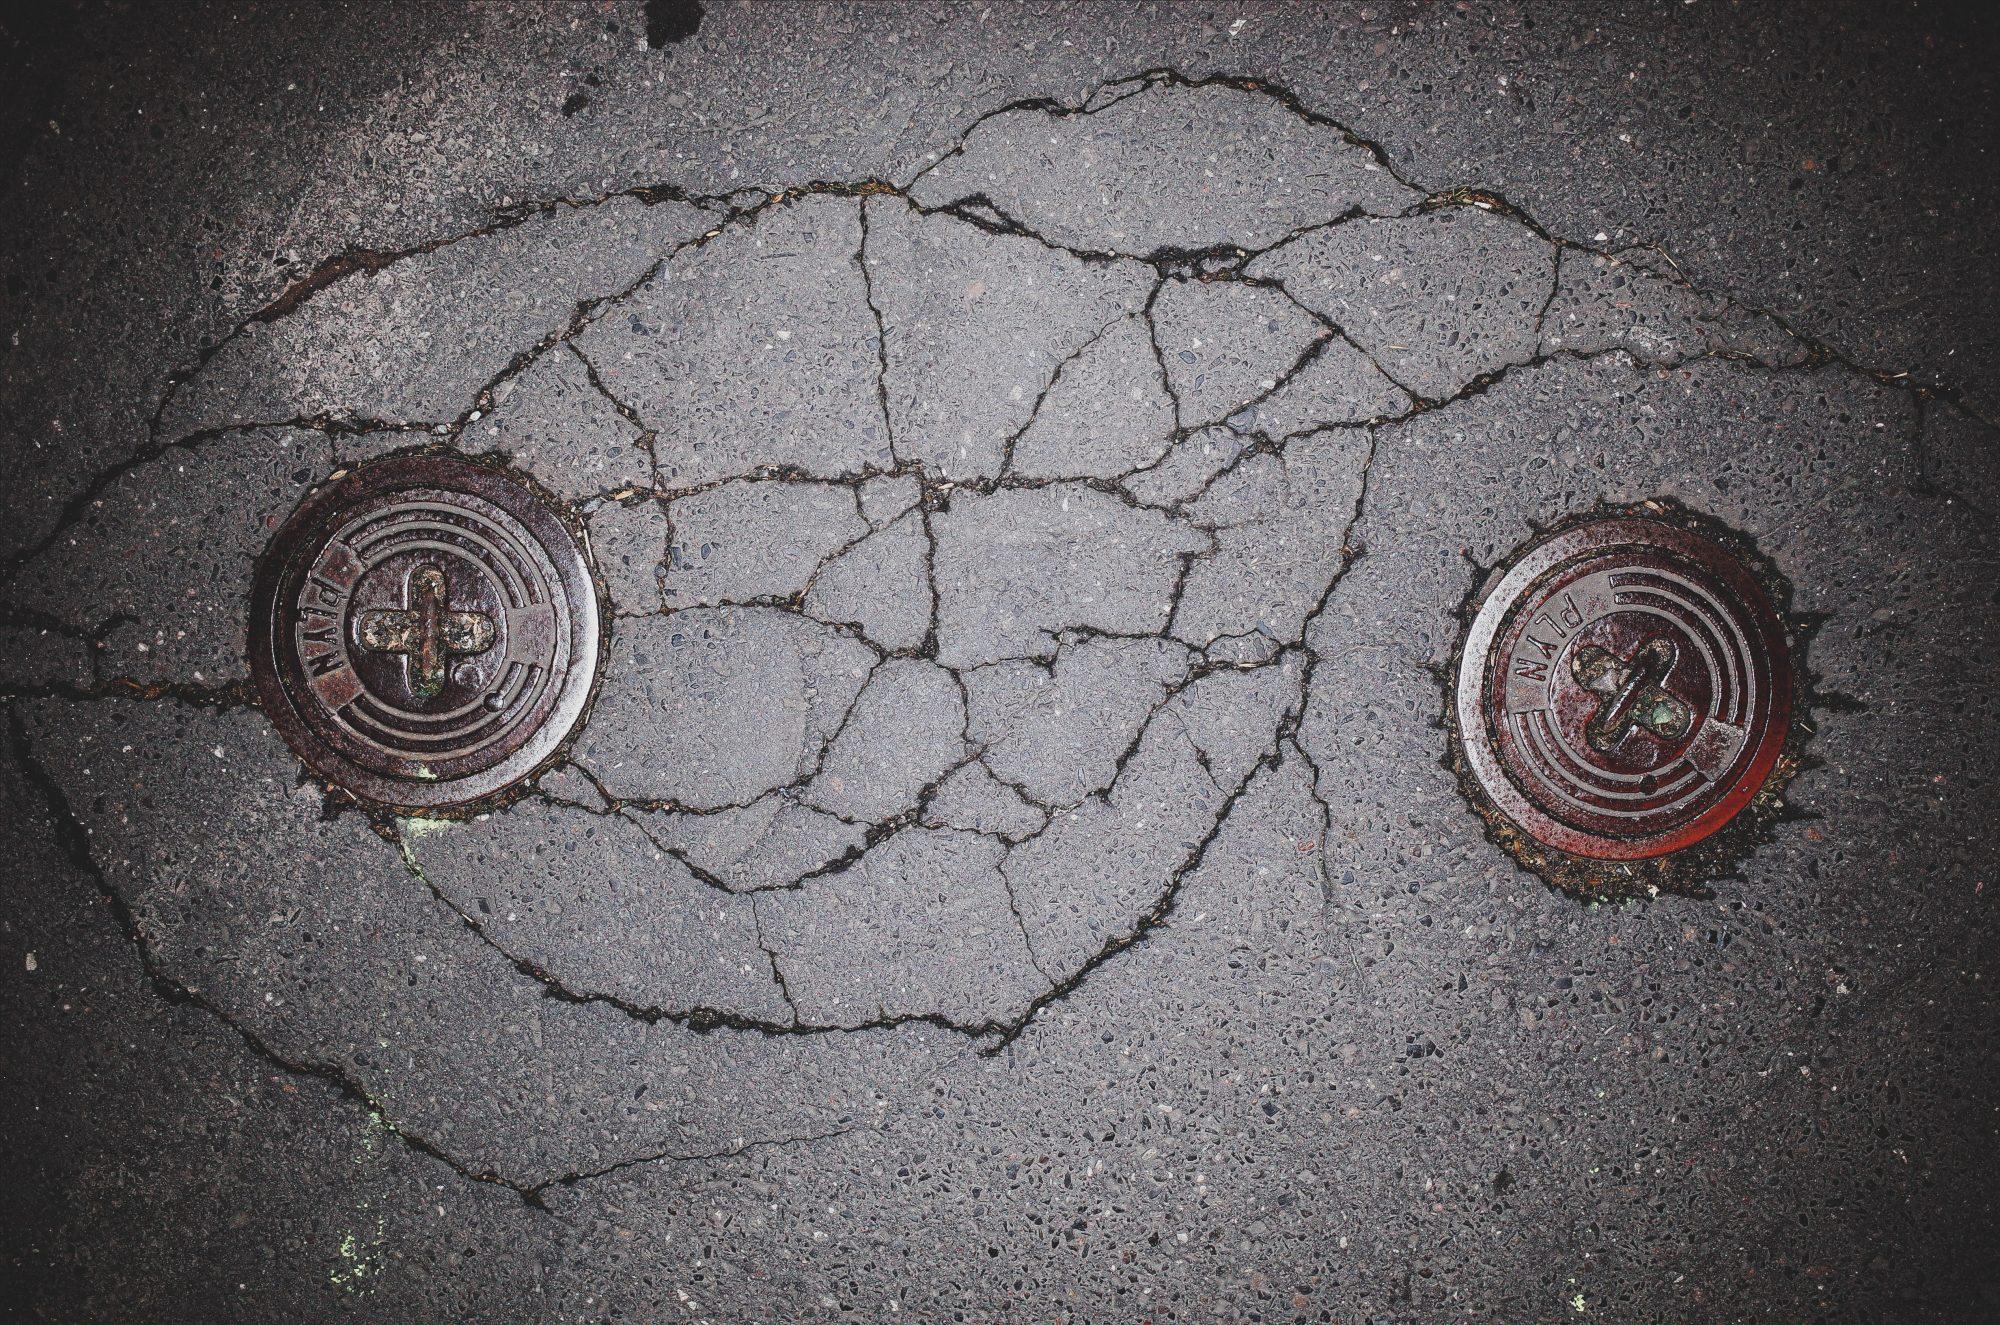 Eyes abstract. Prague pavement, 2017